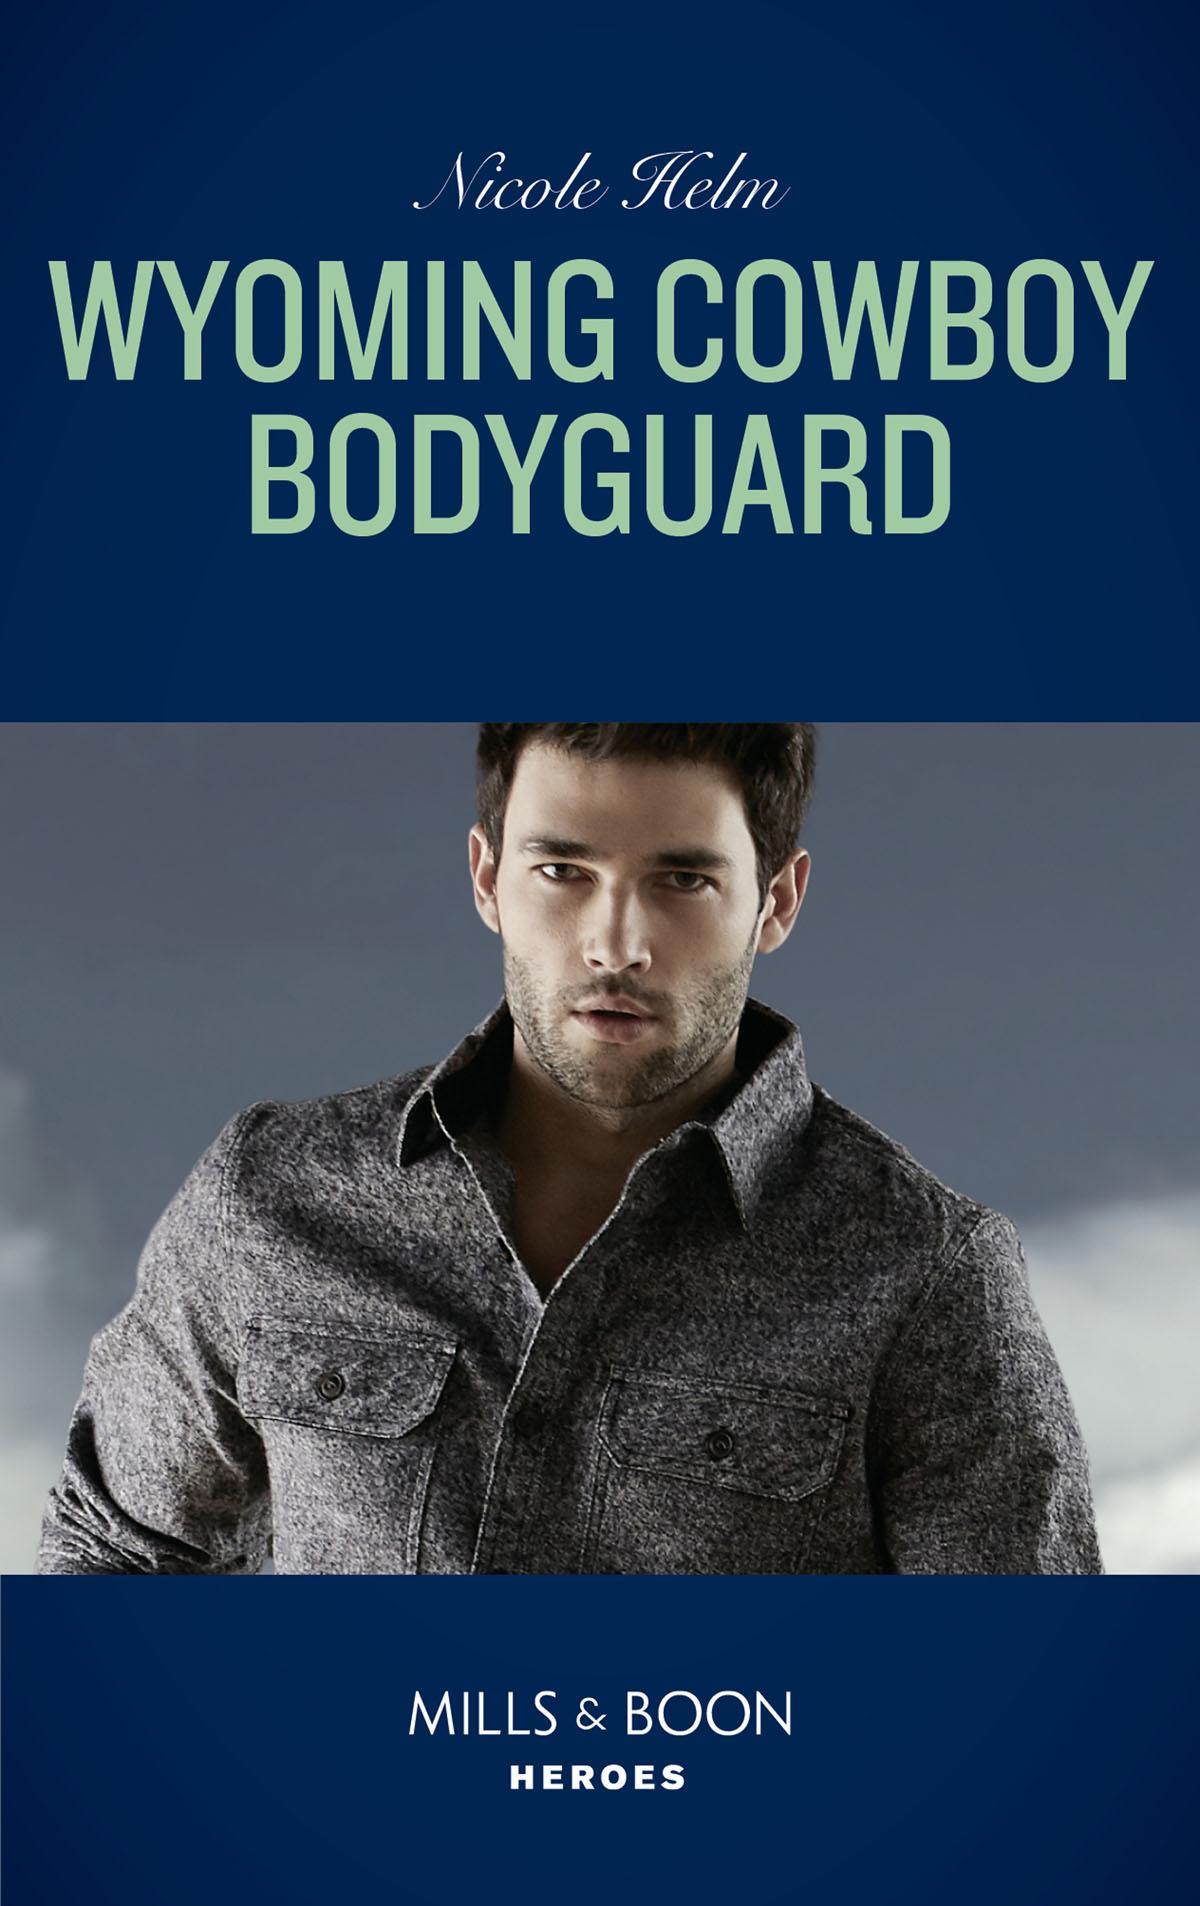 Nicole Helm Wyoming Cowboy Bodyguard bodyguard